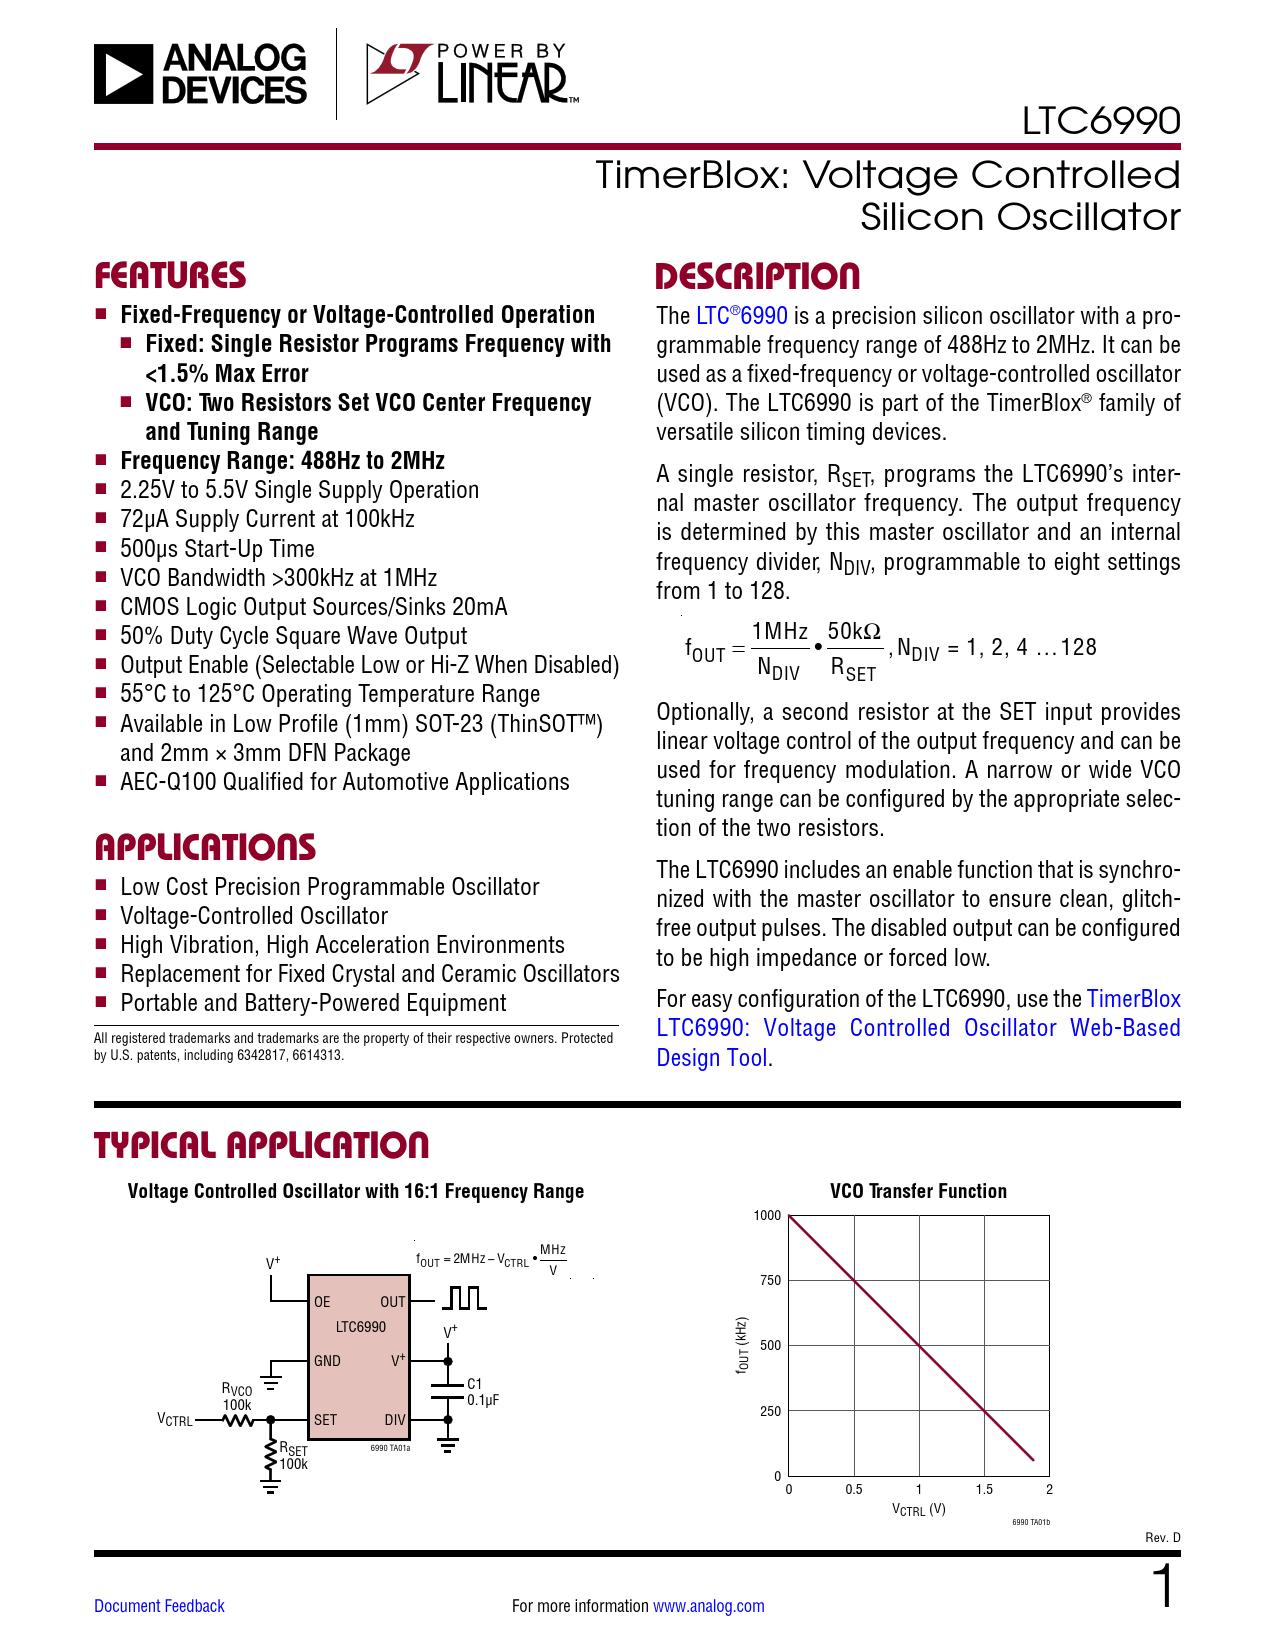 Datasheet LTC6990 Analog Devices, Revision: D